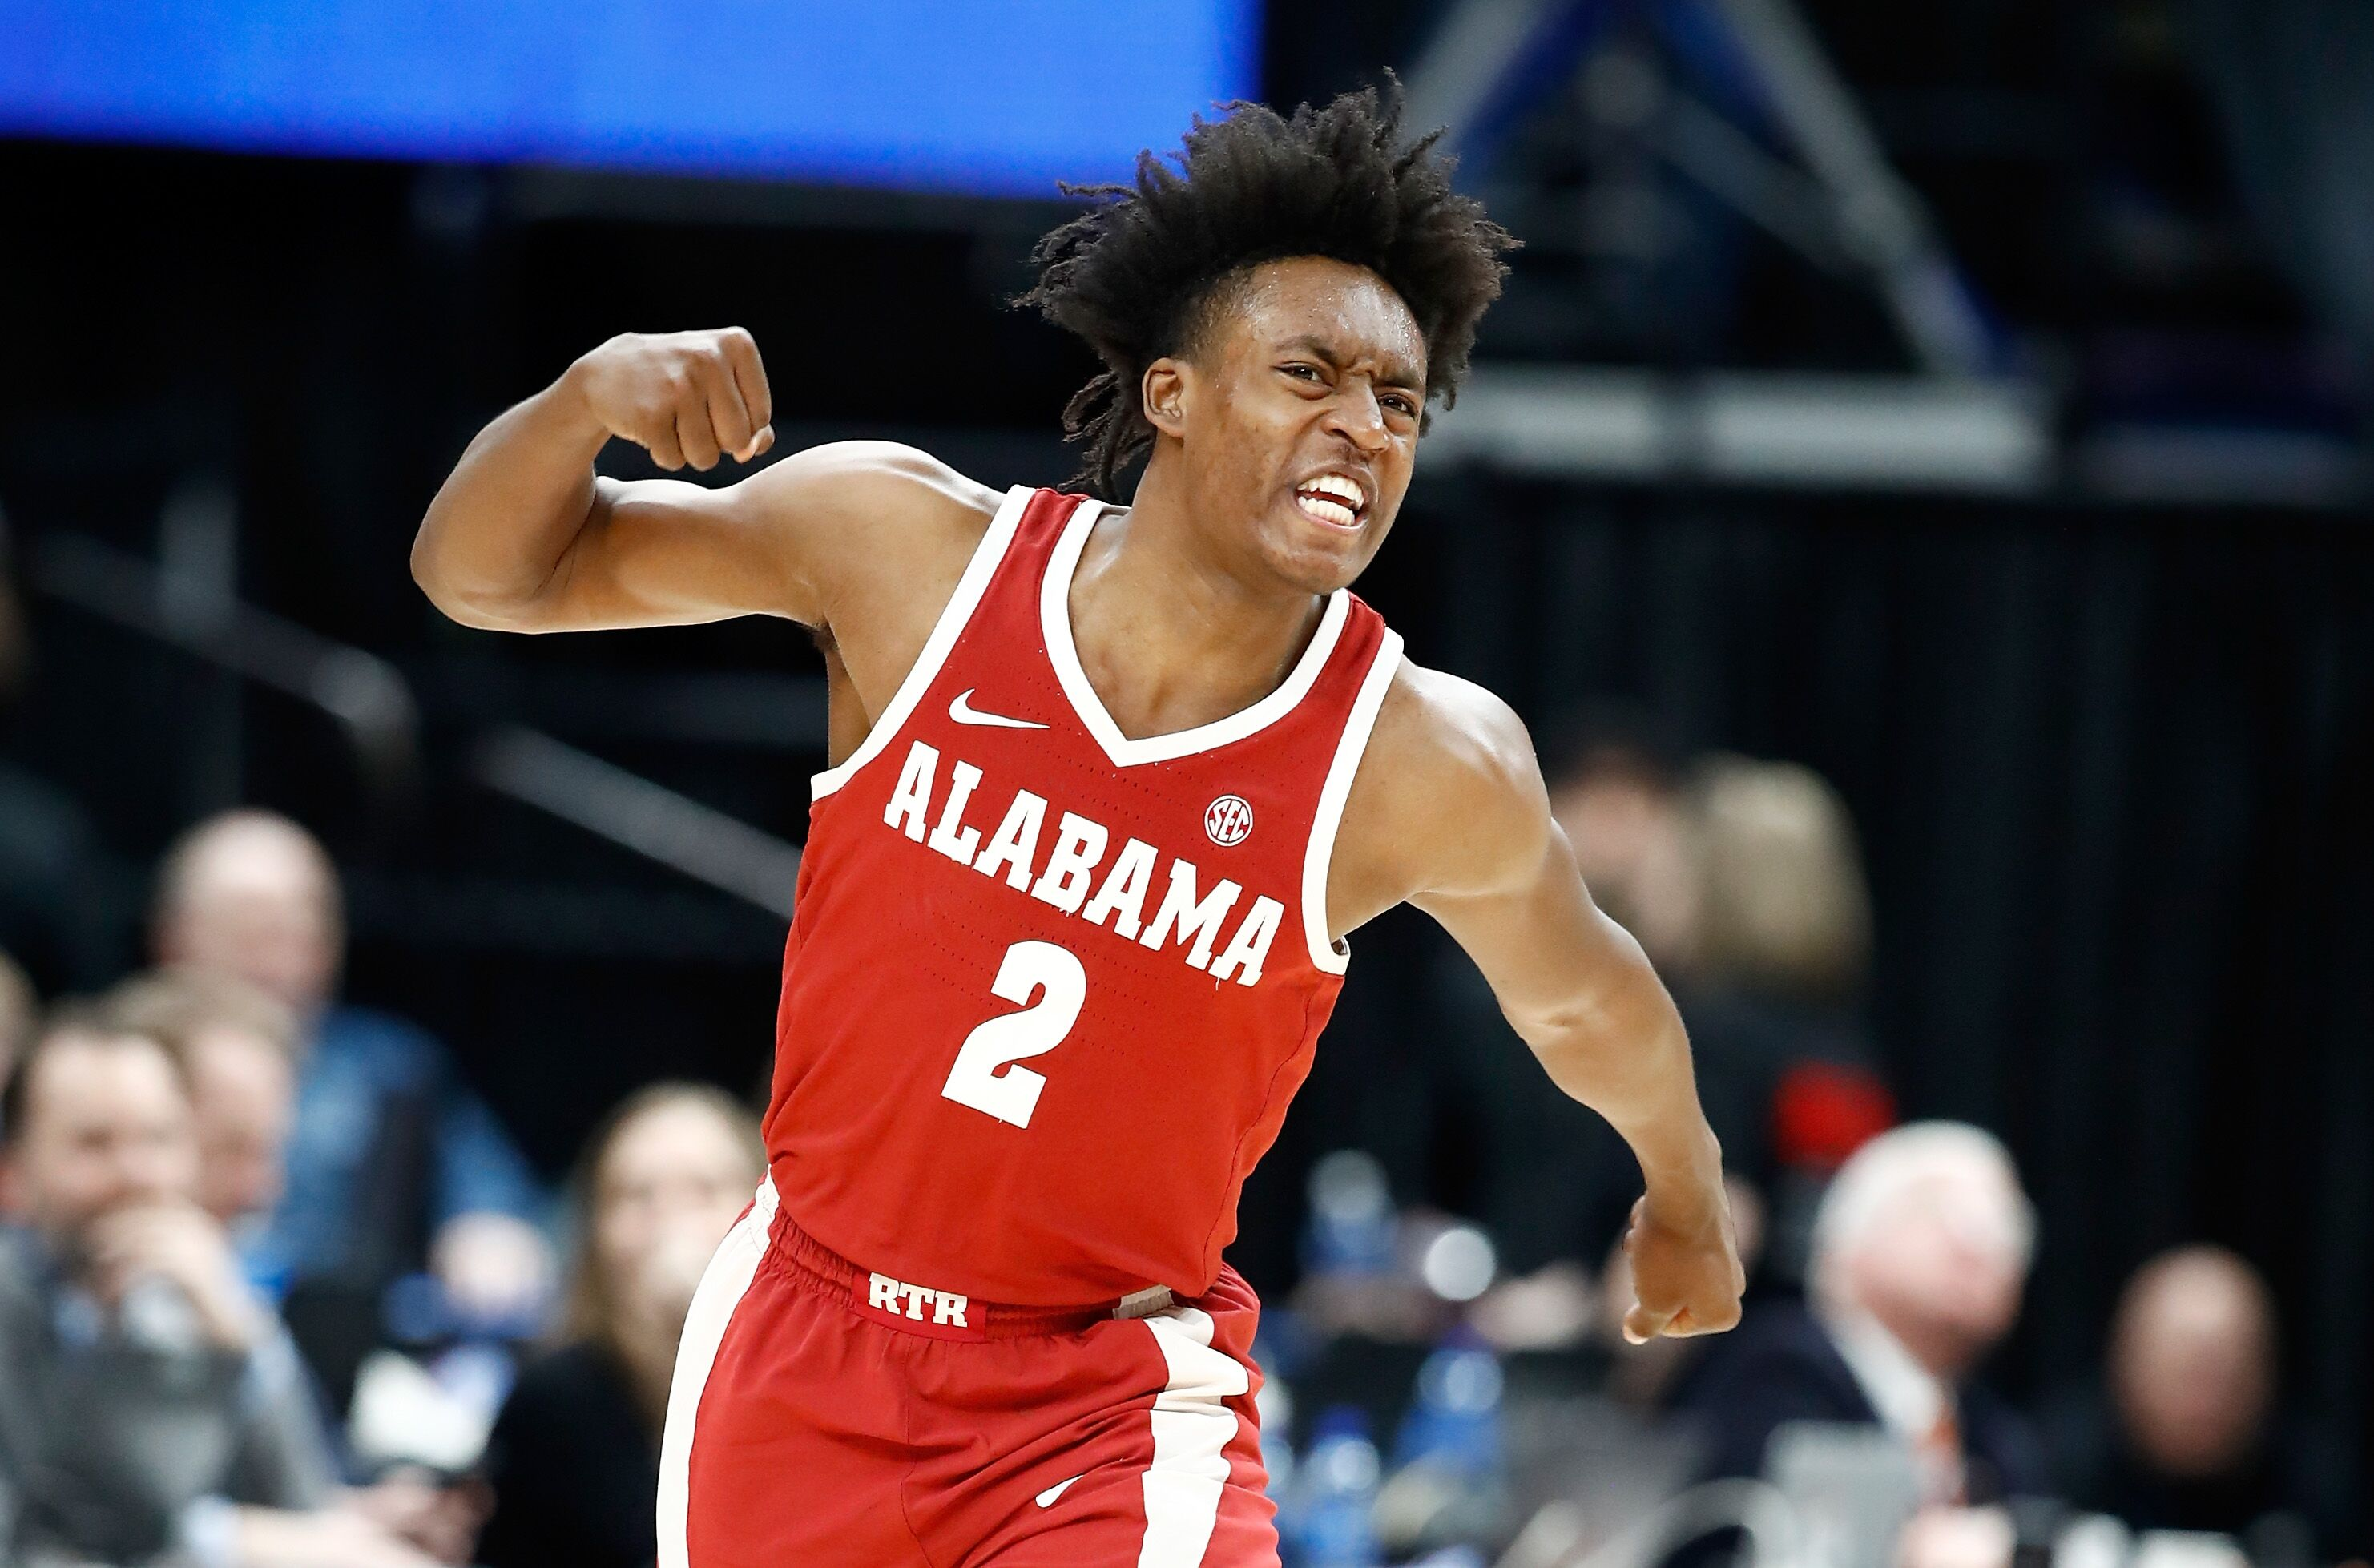 Alabama Vs Auburn Record >> NCAA Tournament 2018, Alabama vs Virginia Tech: Watch online, live stream, box score